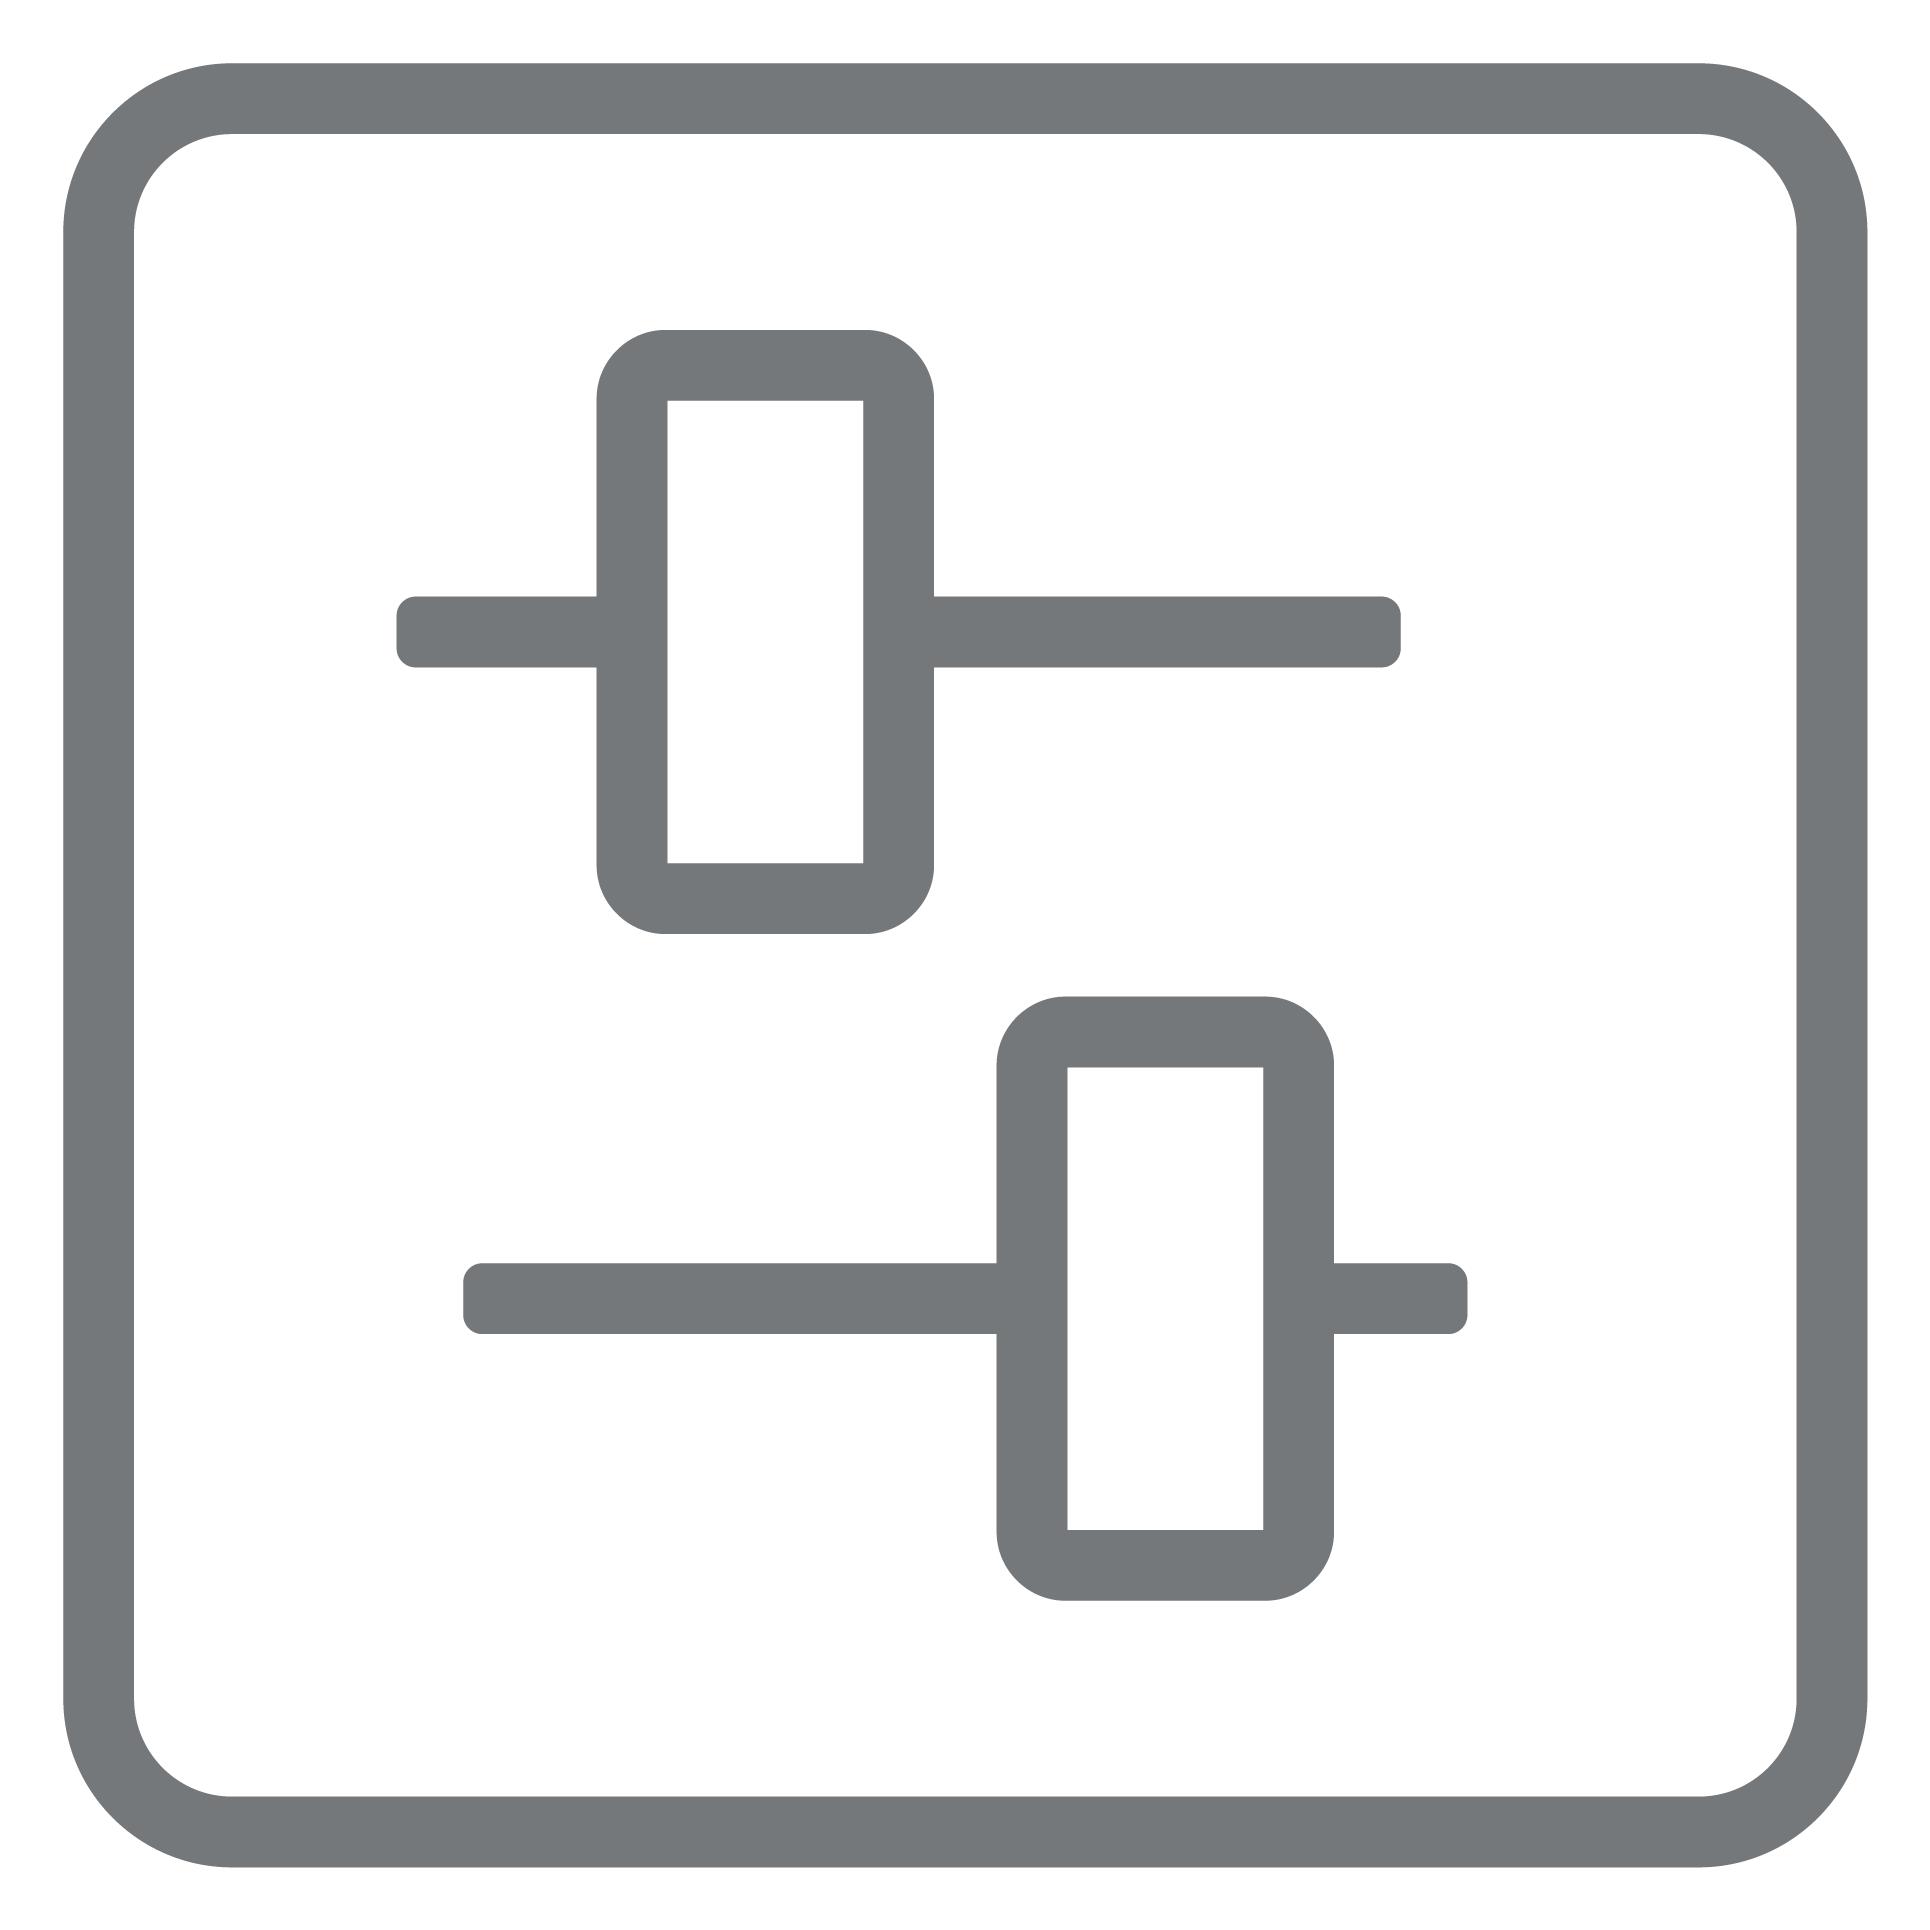 sliders-h-square